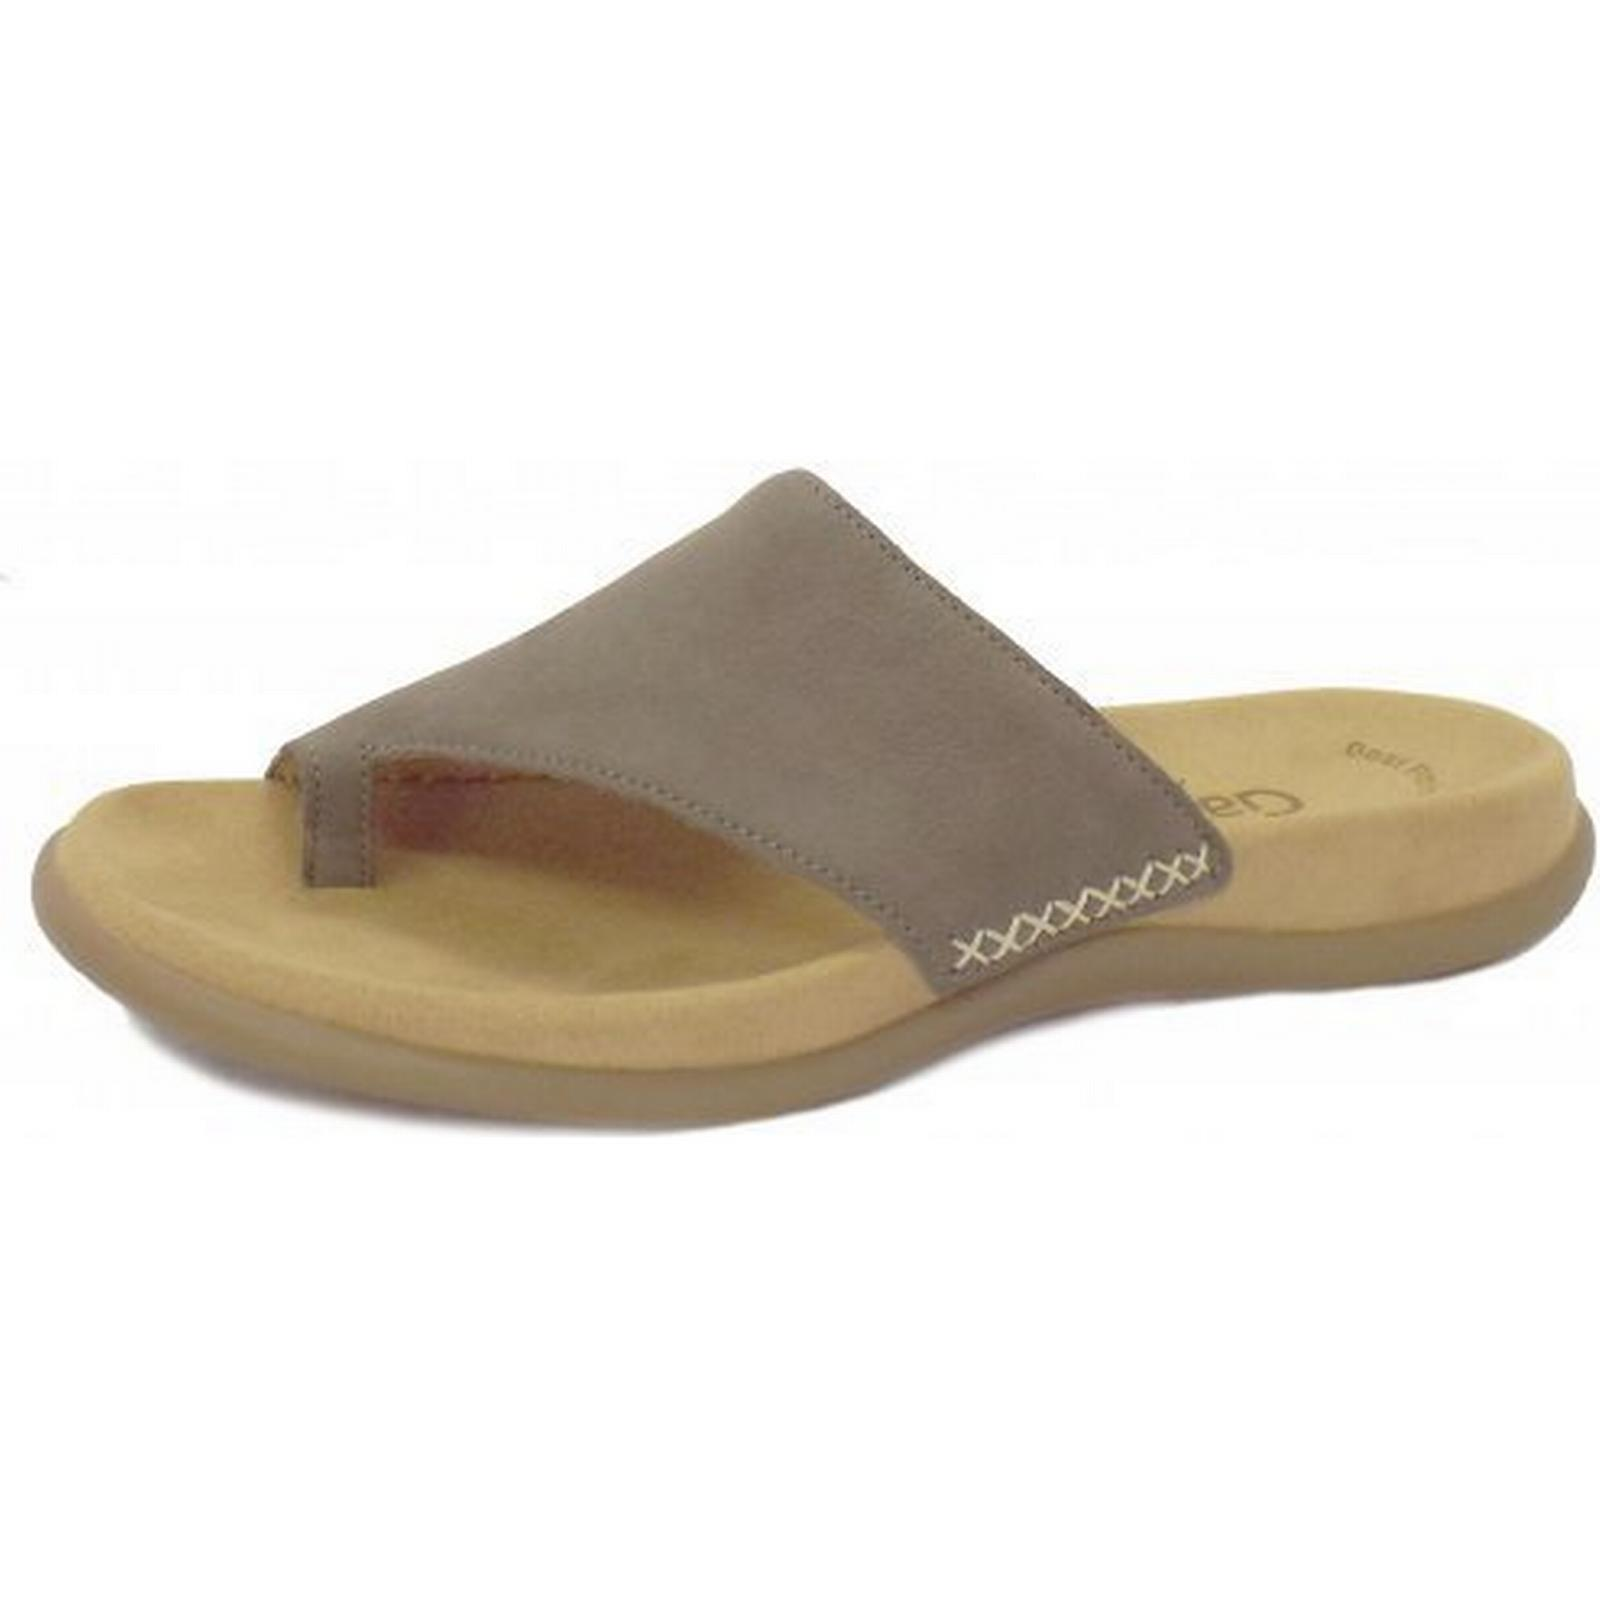 gabor lanzarote gabor gabor gabor mesdames les sandales de lanzarote, taille: 39, couleur: gris clair. d5af5a